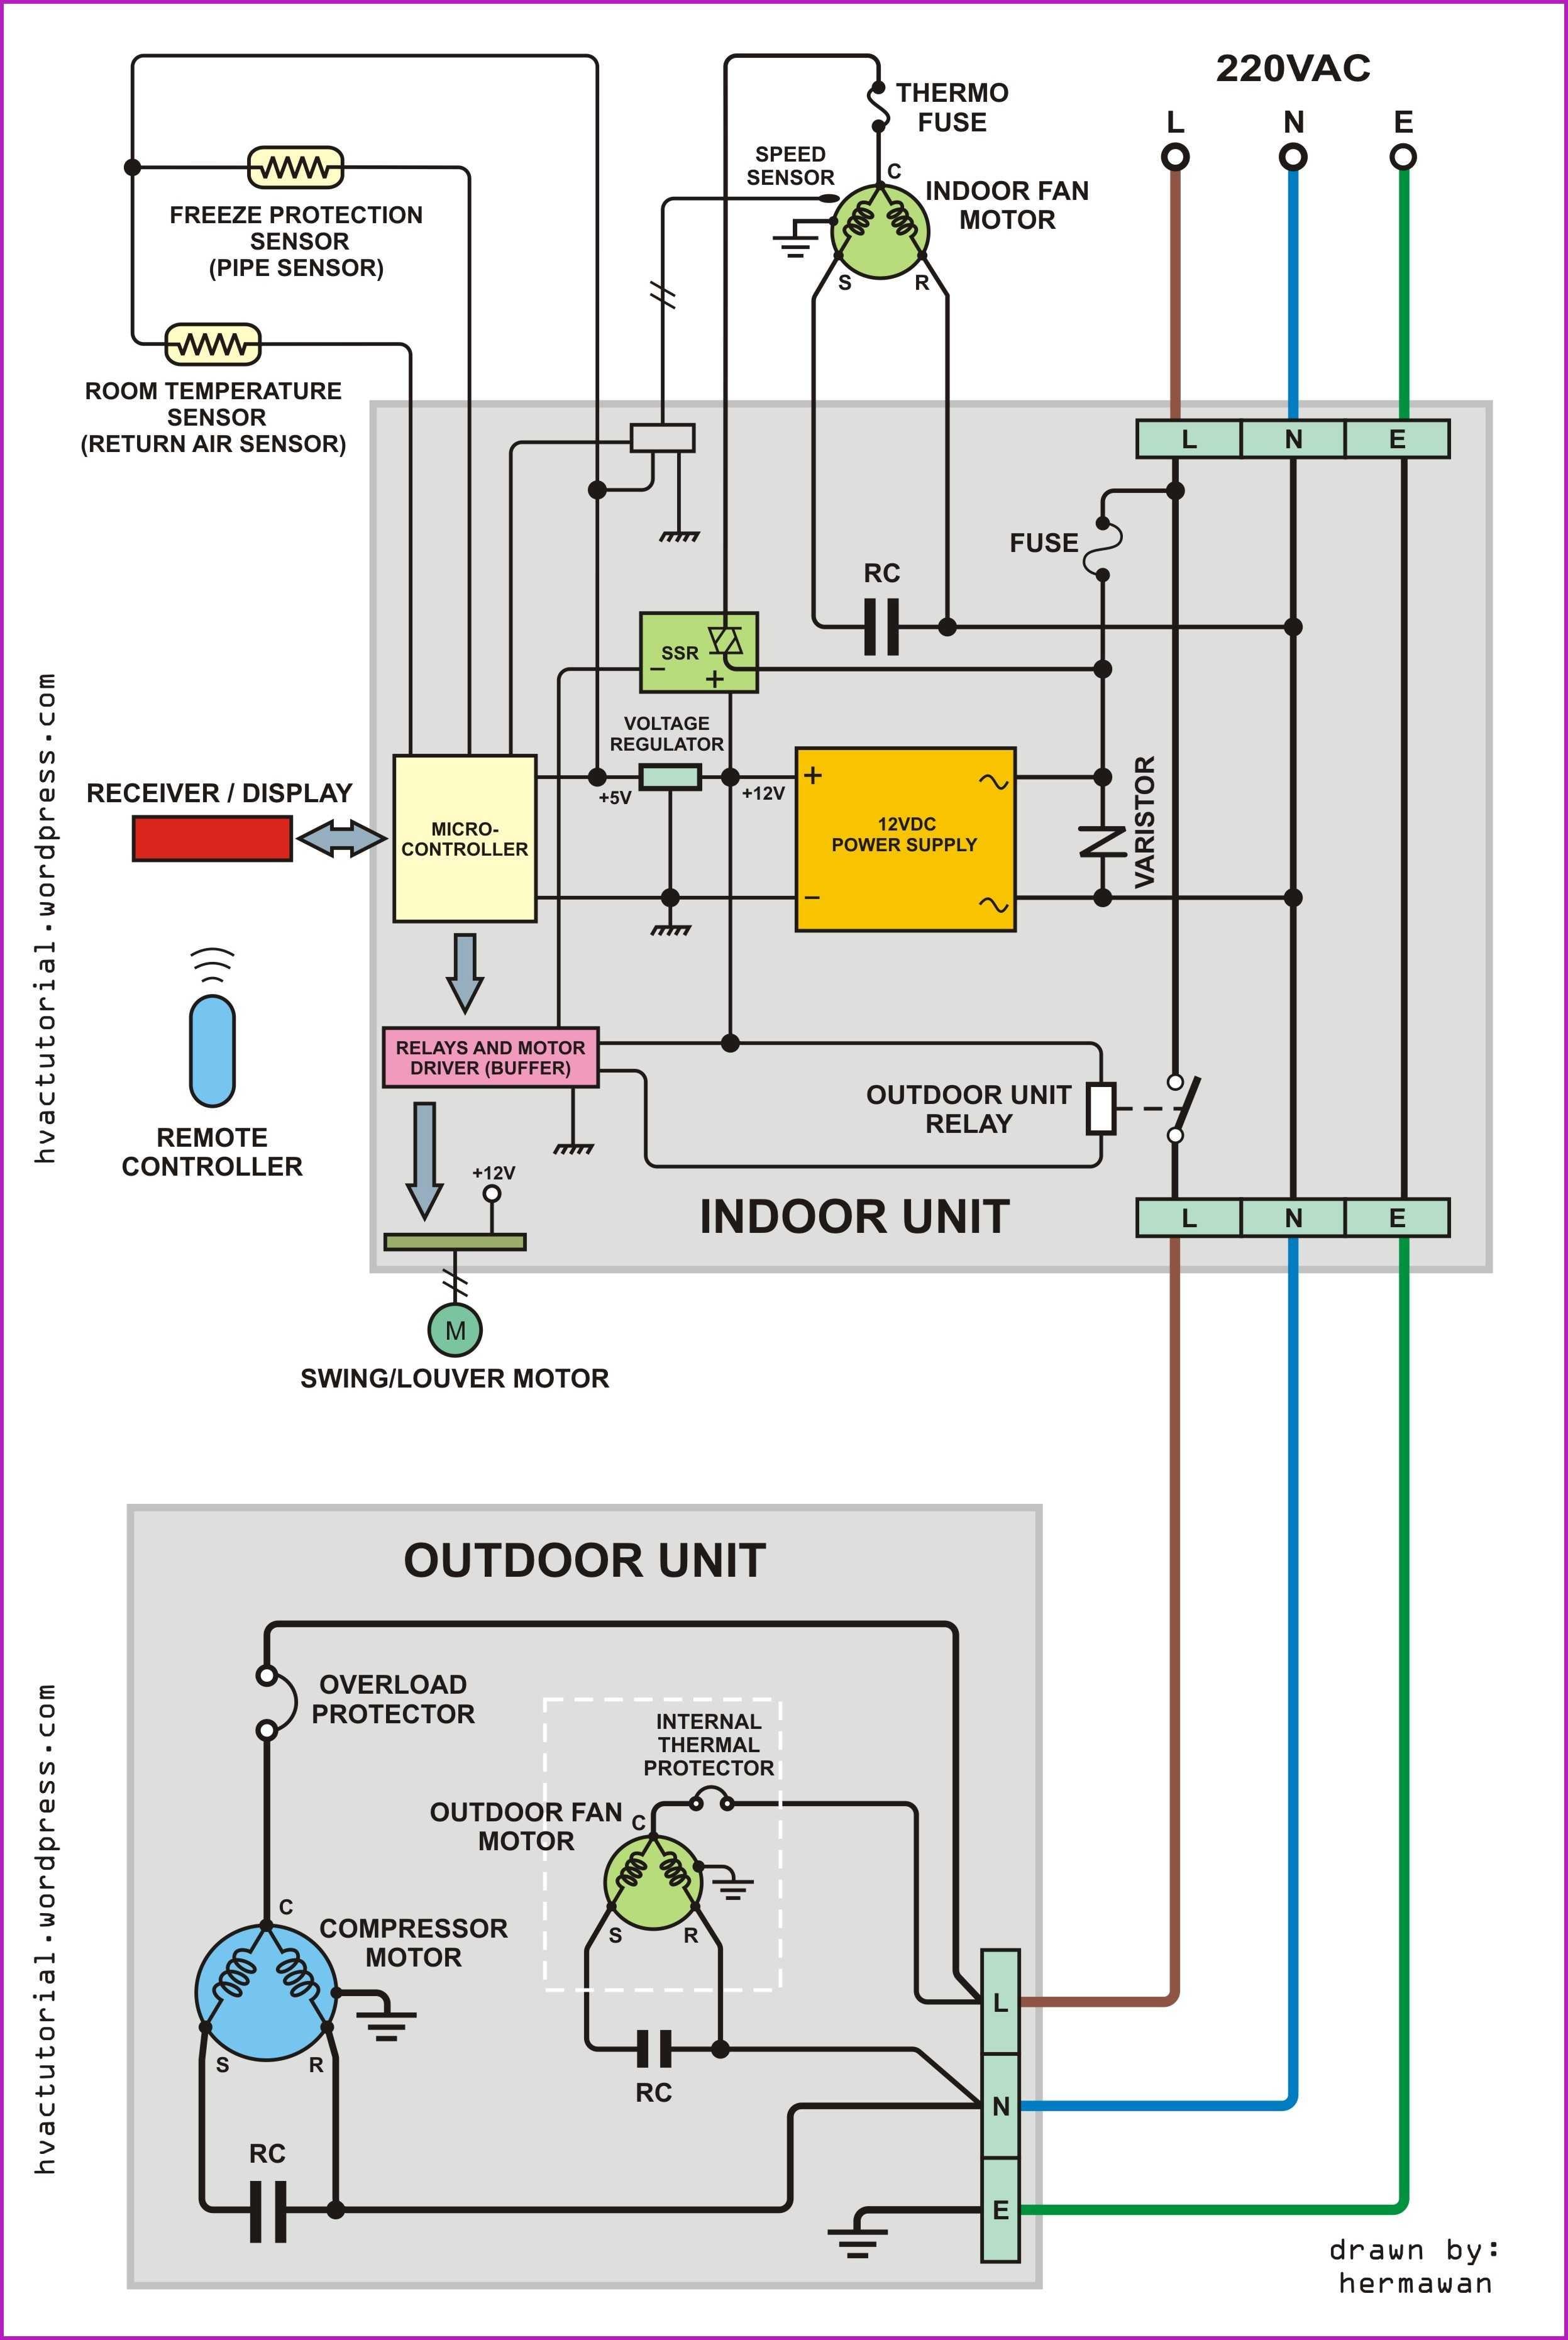 Outstanding trane air handler wiring schematics elaboration trane ac wiring diagram wiring diagram fandeluxe Images